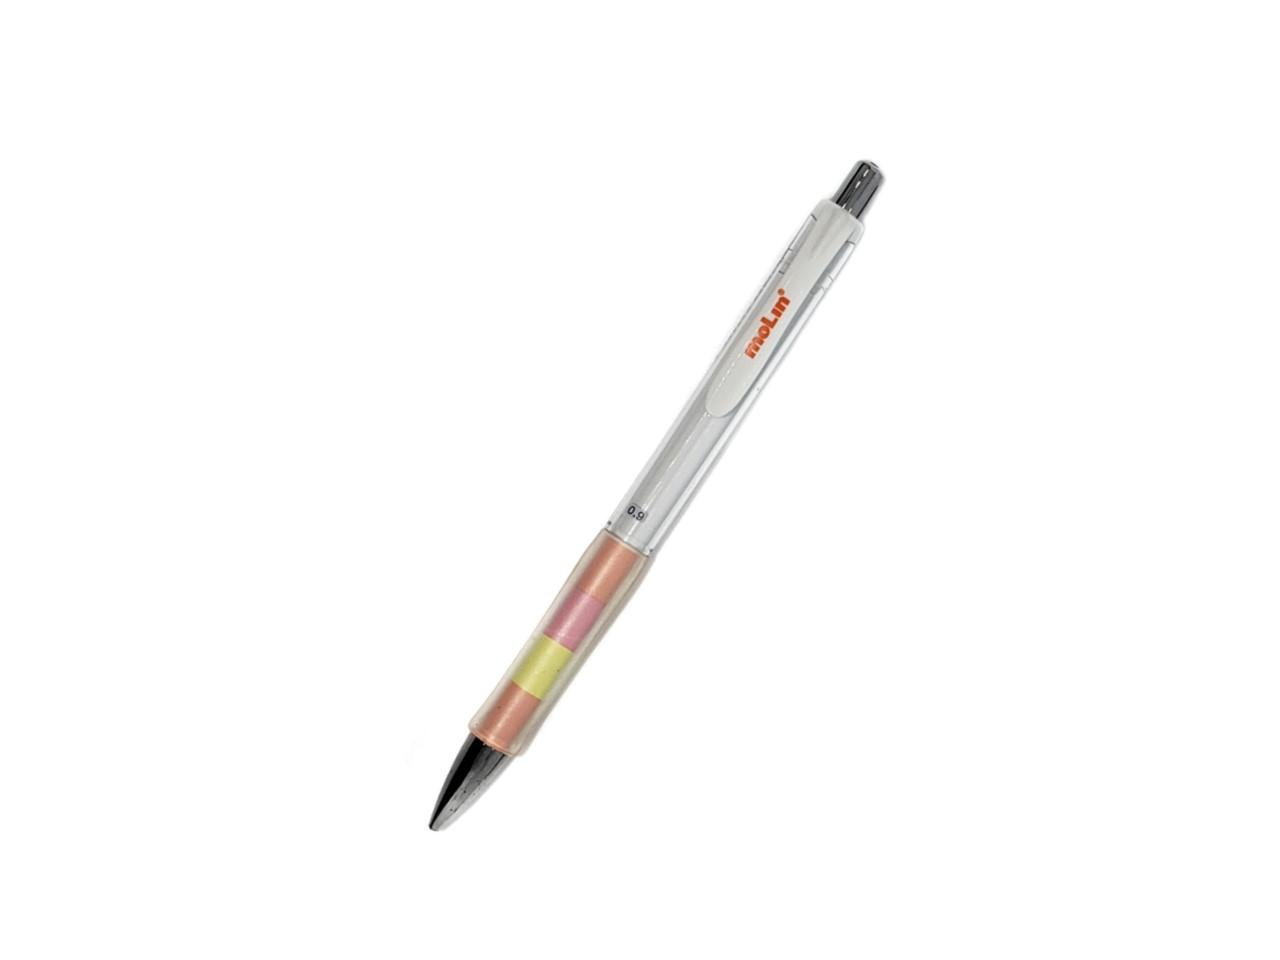 Lapiseira WPK 0,9mm Cores - Branco